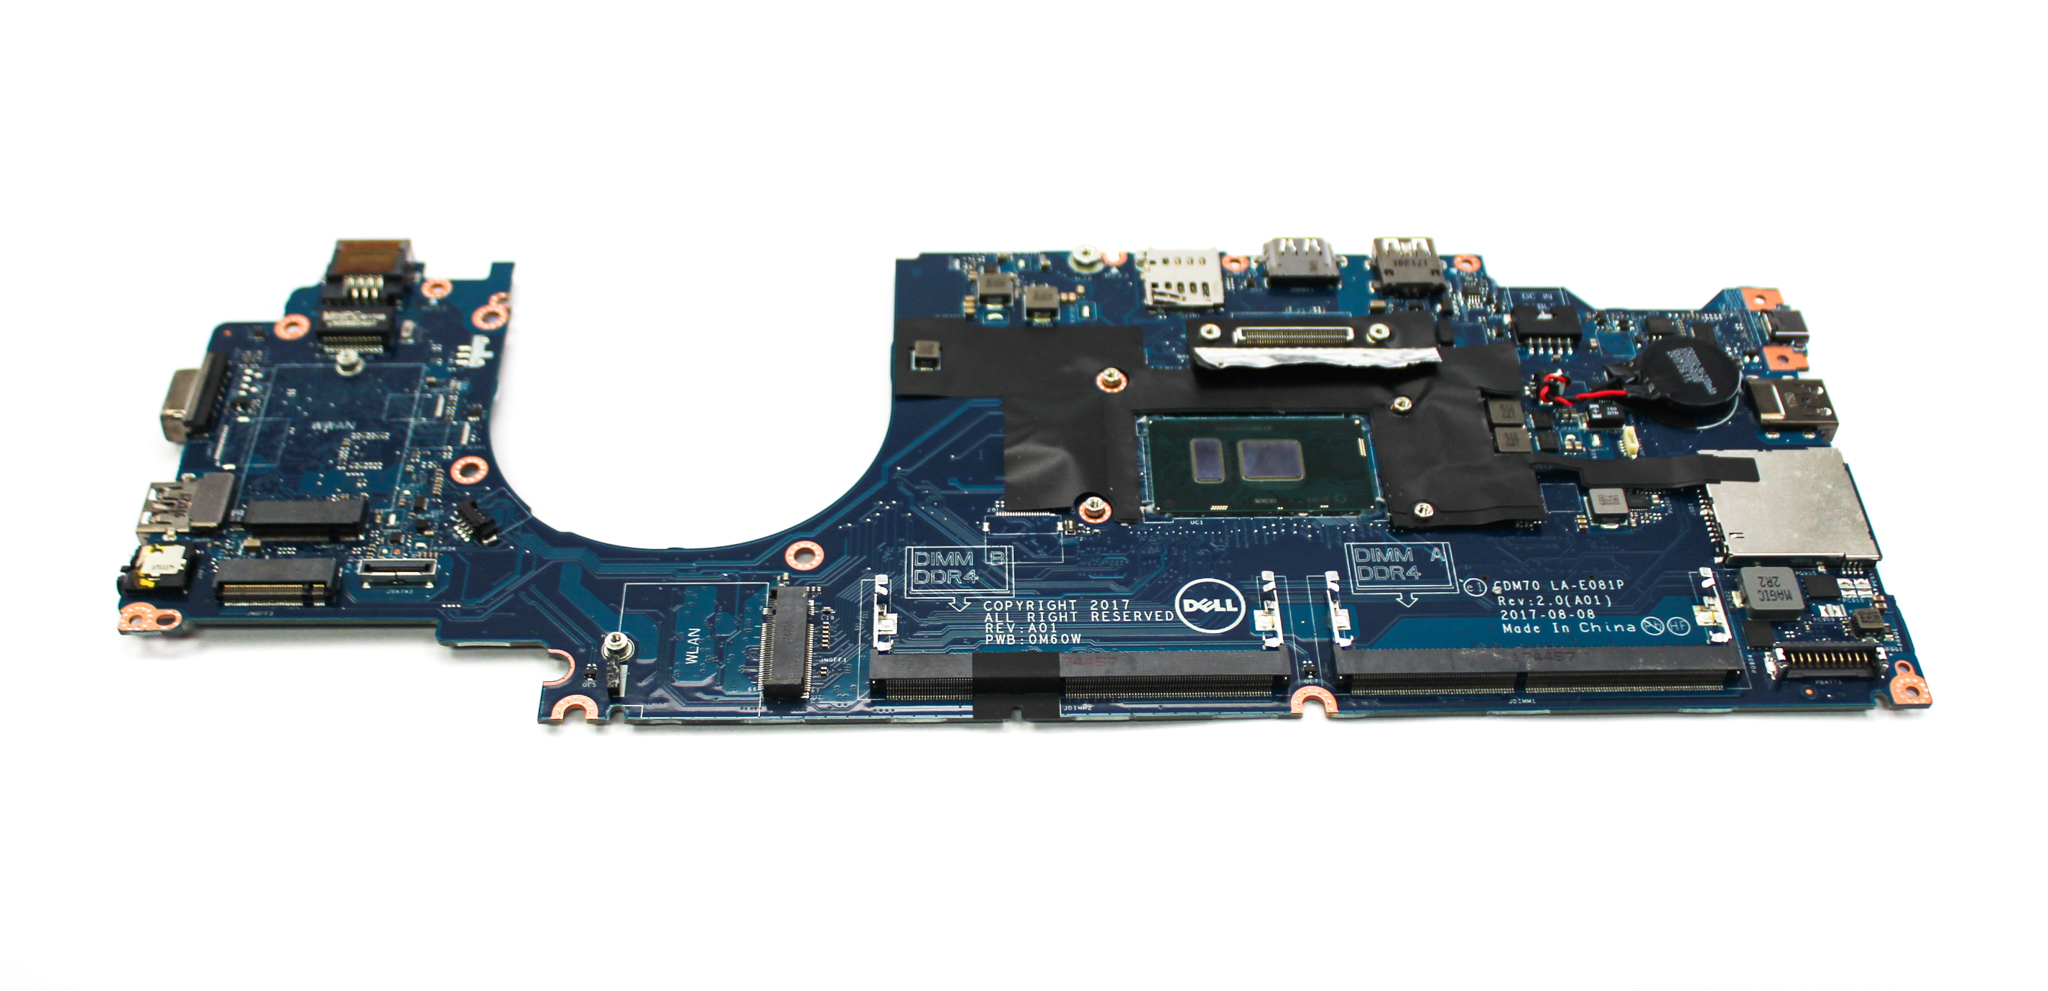 RR5H9 Dell Latitude 5480 Laptop Motherboard /w BGA Core i5-8250U CPU